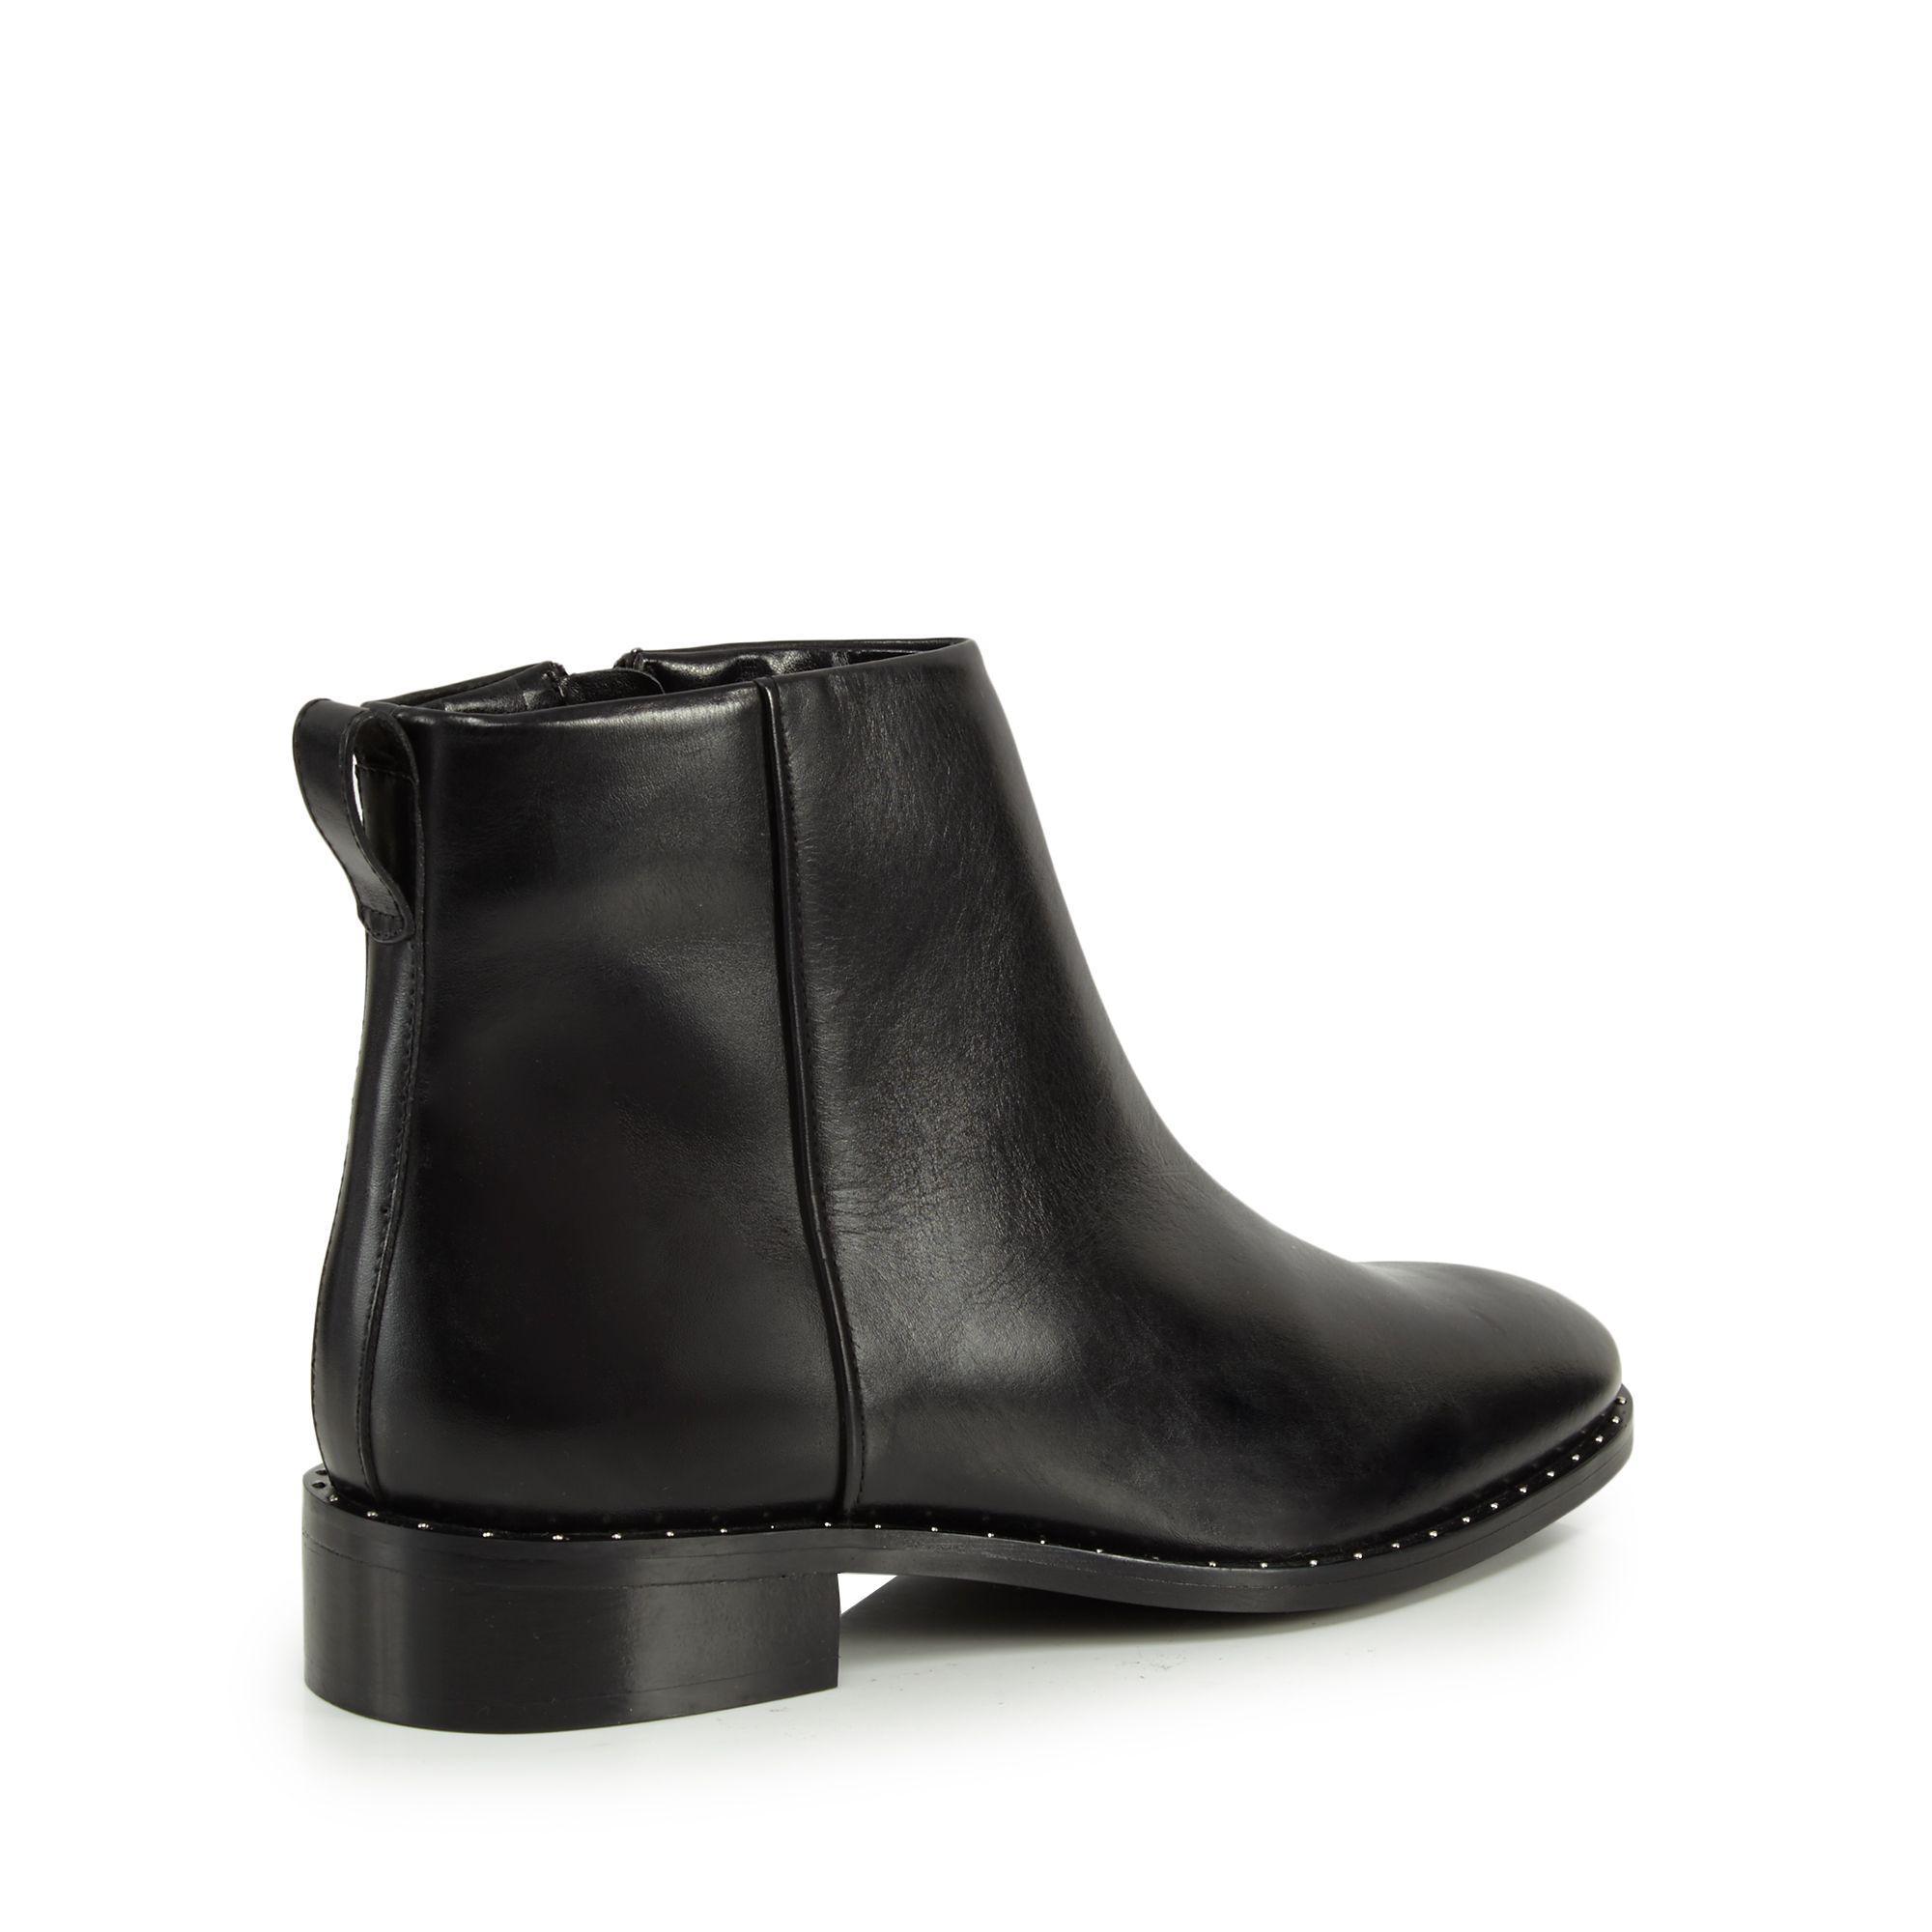 J By Jasper Conran Black Leather 'judd' Block Heel Ankle Boots